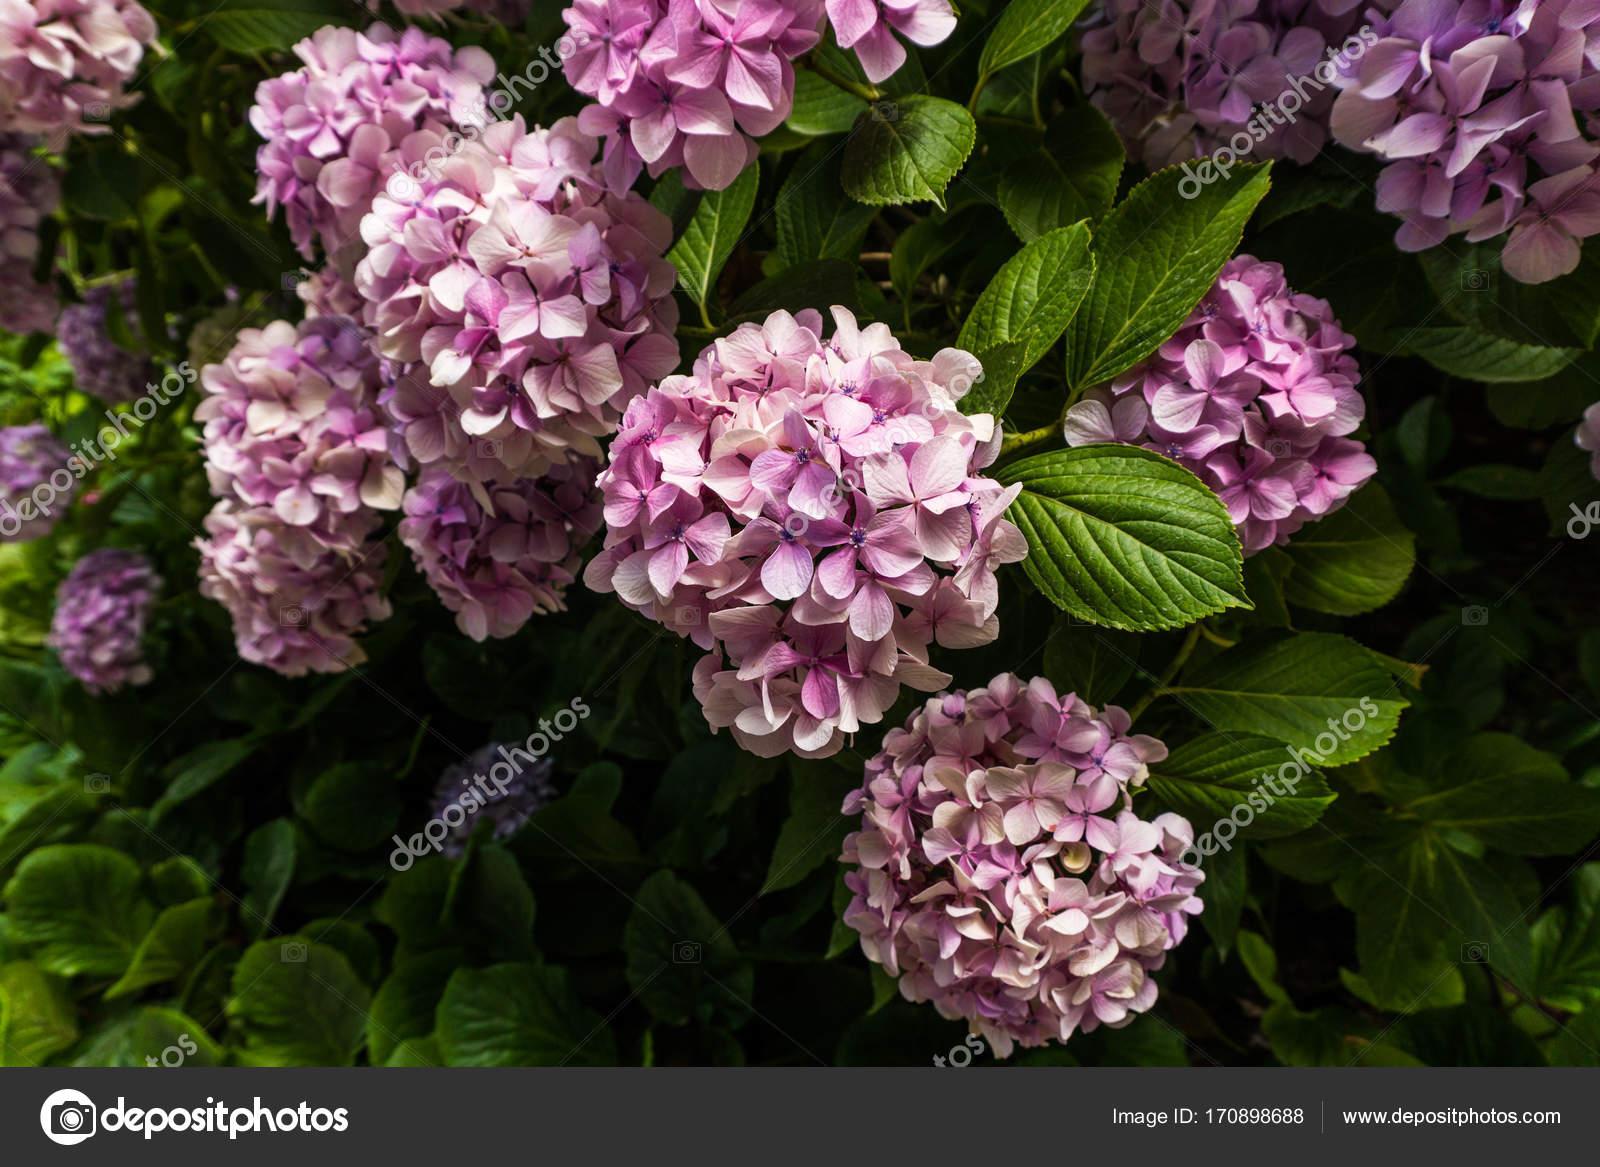 Great Bush Of Pink Flower Hydrangea Blooming In The Garden Stock